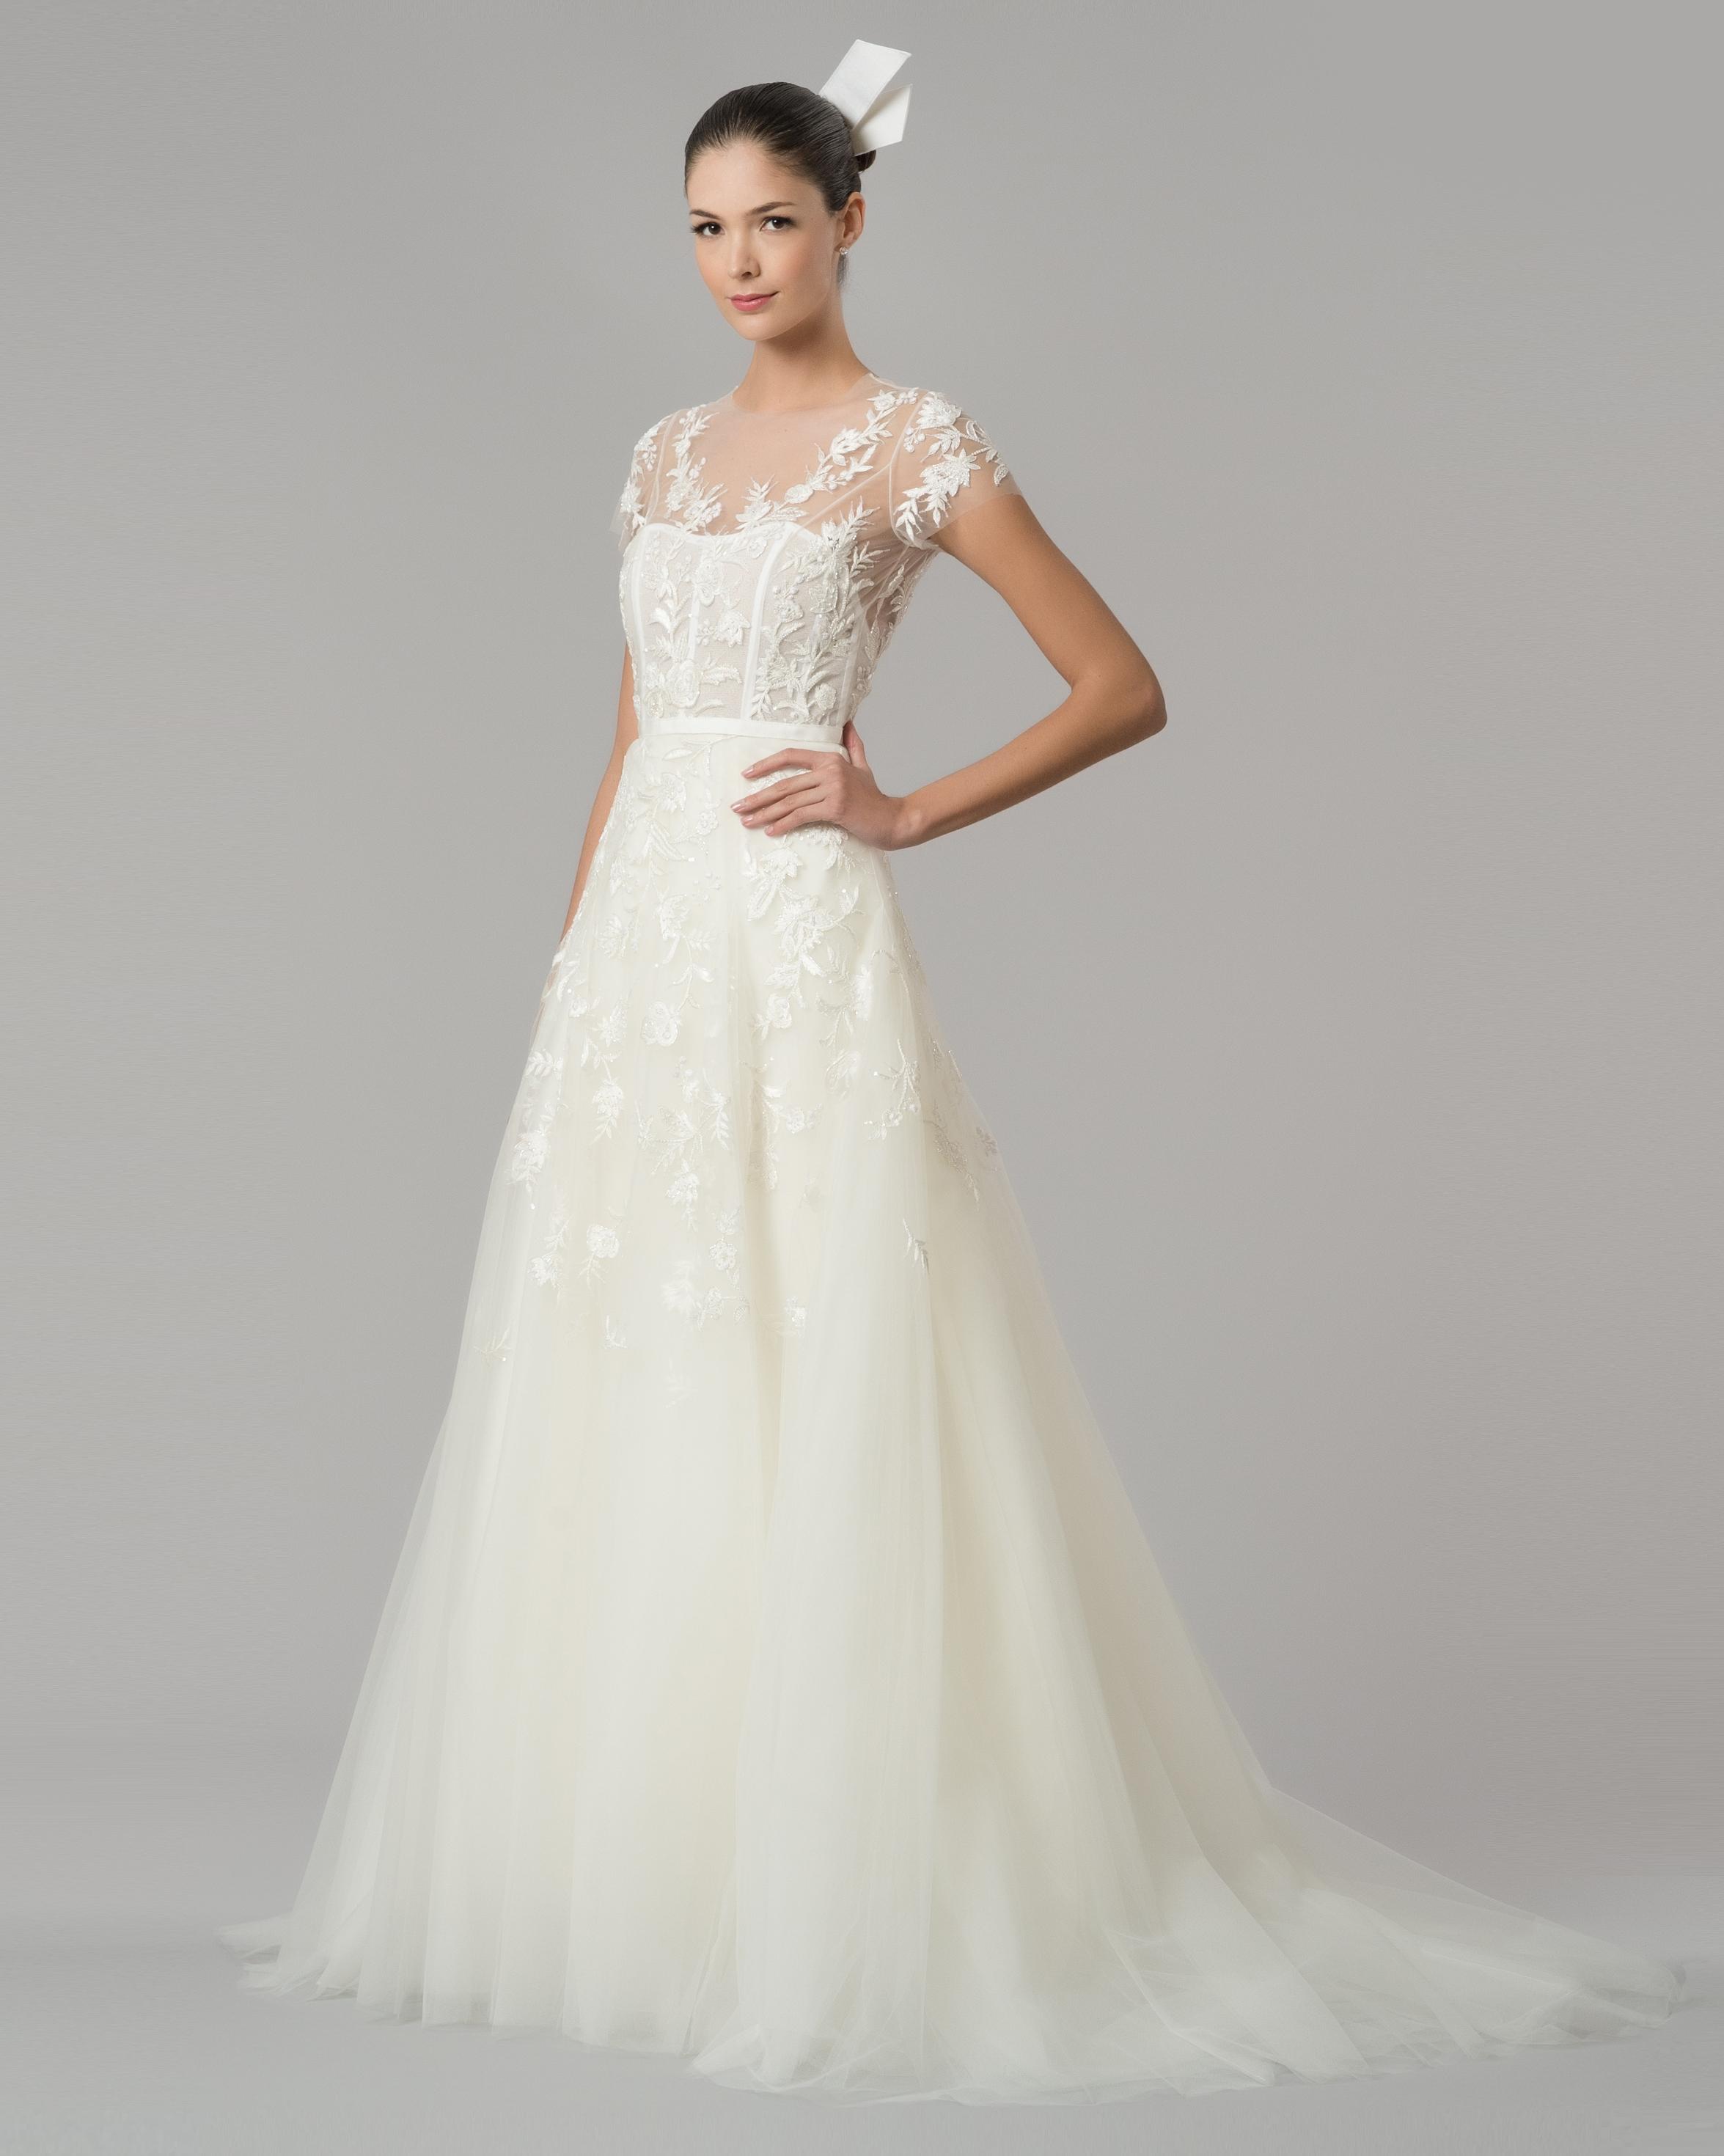 Carolina Herrera Wedding Dress.Carolina Herrera Fall 2015 Bridal Collection Martha